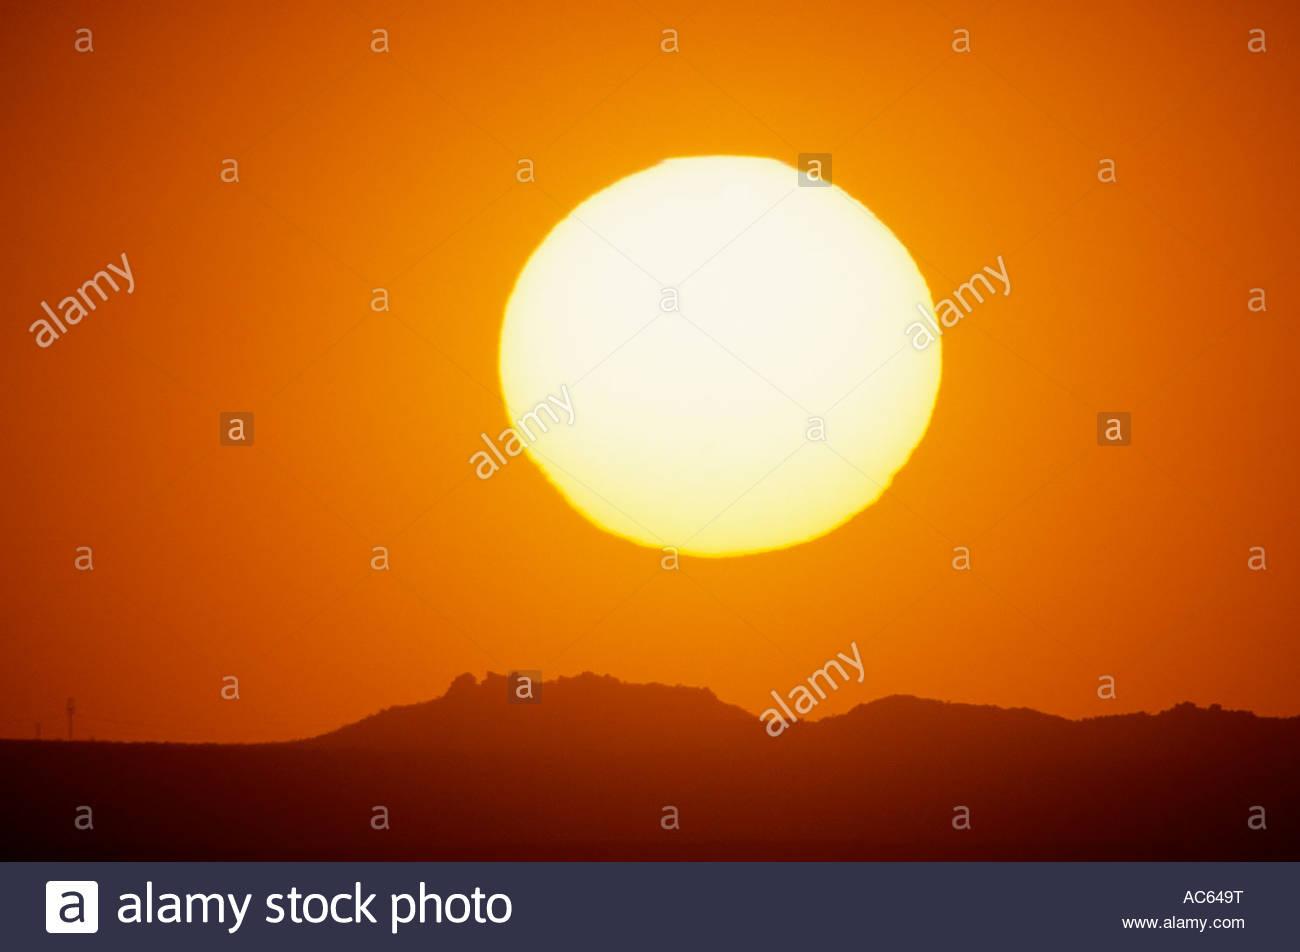 The glowing hot desert sun setting on mountains south of Tucson Arizona sunset orange - Stock Image